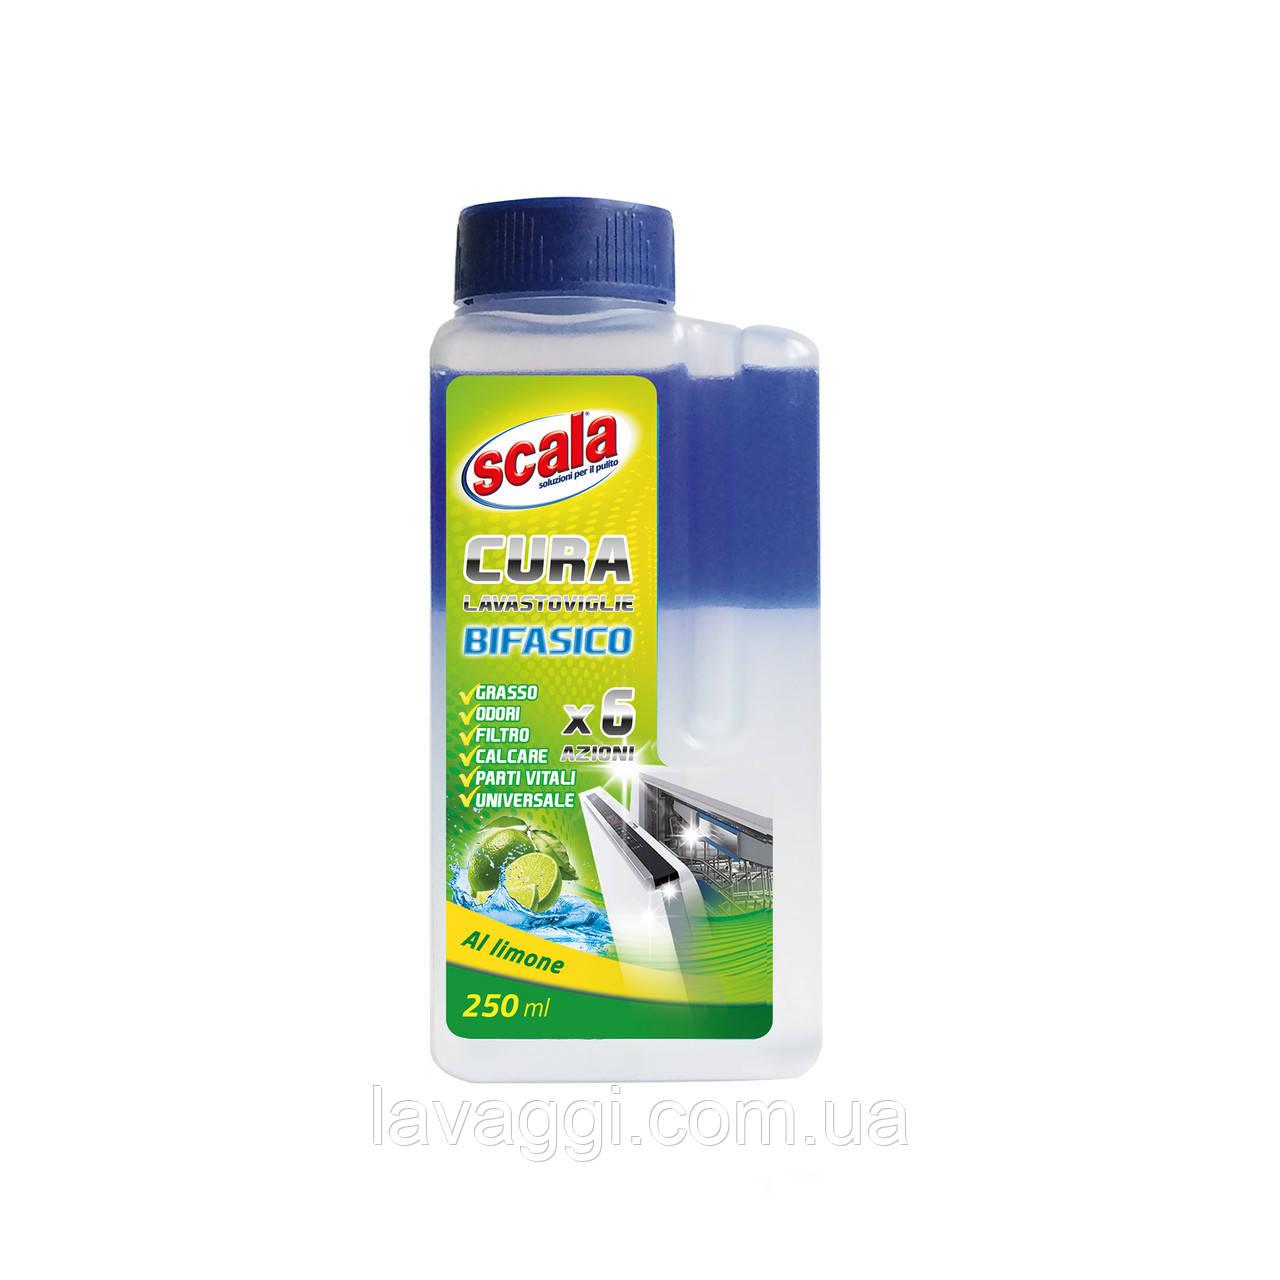 Двофазний очищувач для посудомийної машини Scala Cura Lavastoviglie Bifasico 250 ml